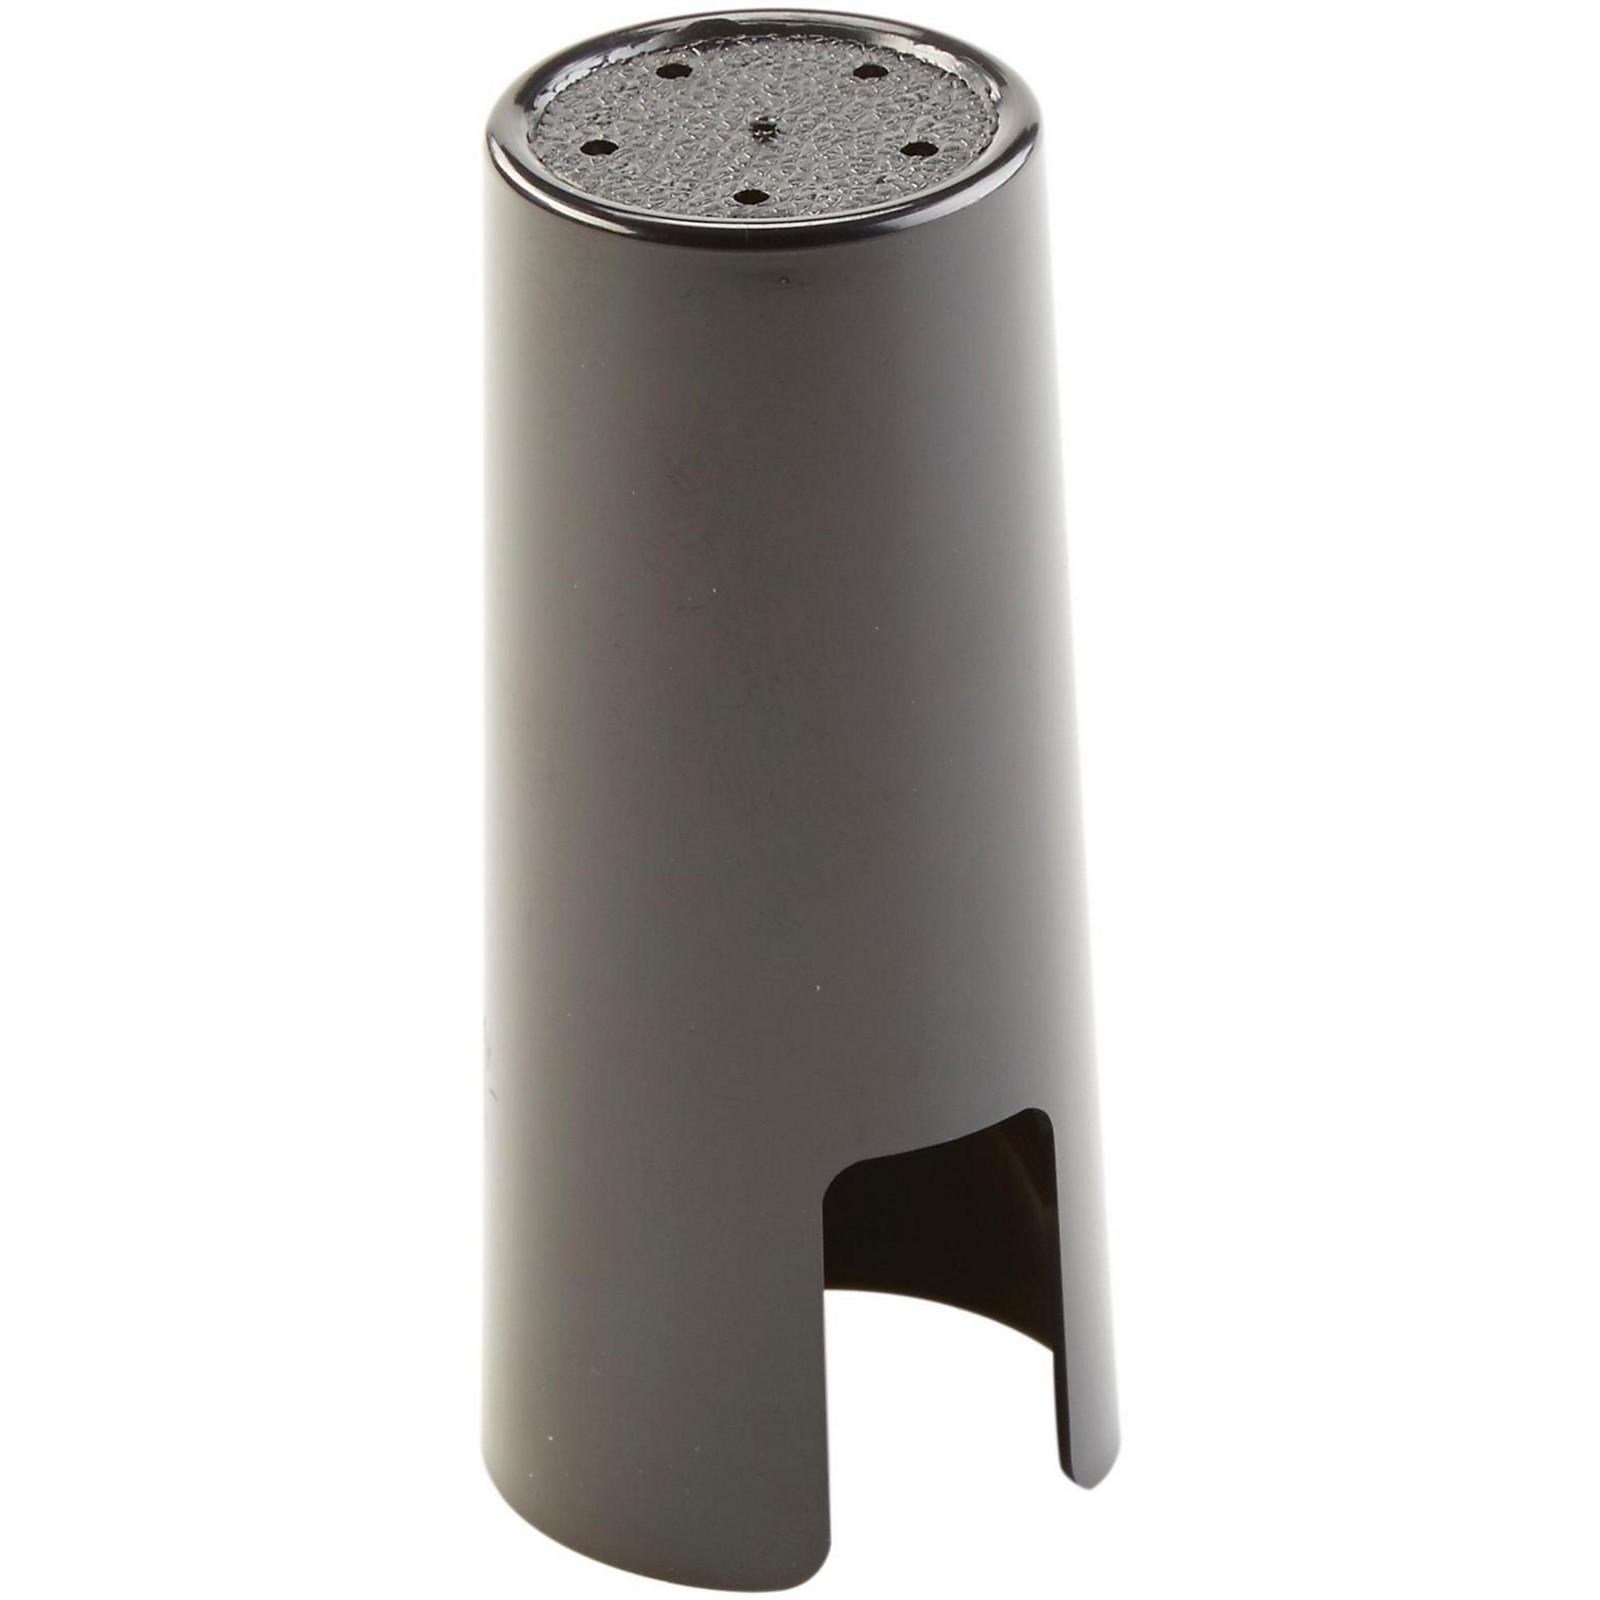 Giardinelli Tenor Saxophone Mouthpiece Cap